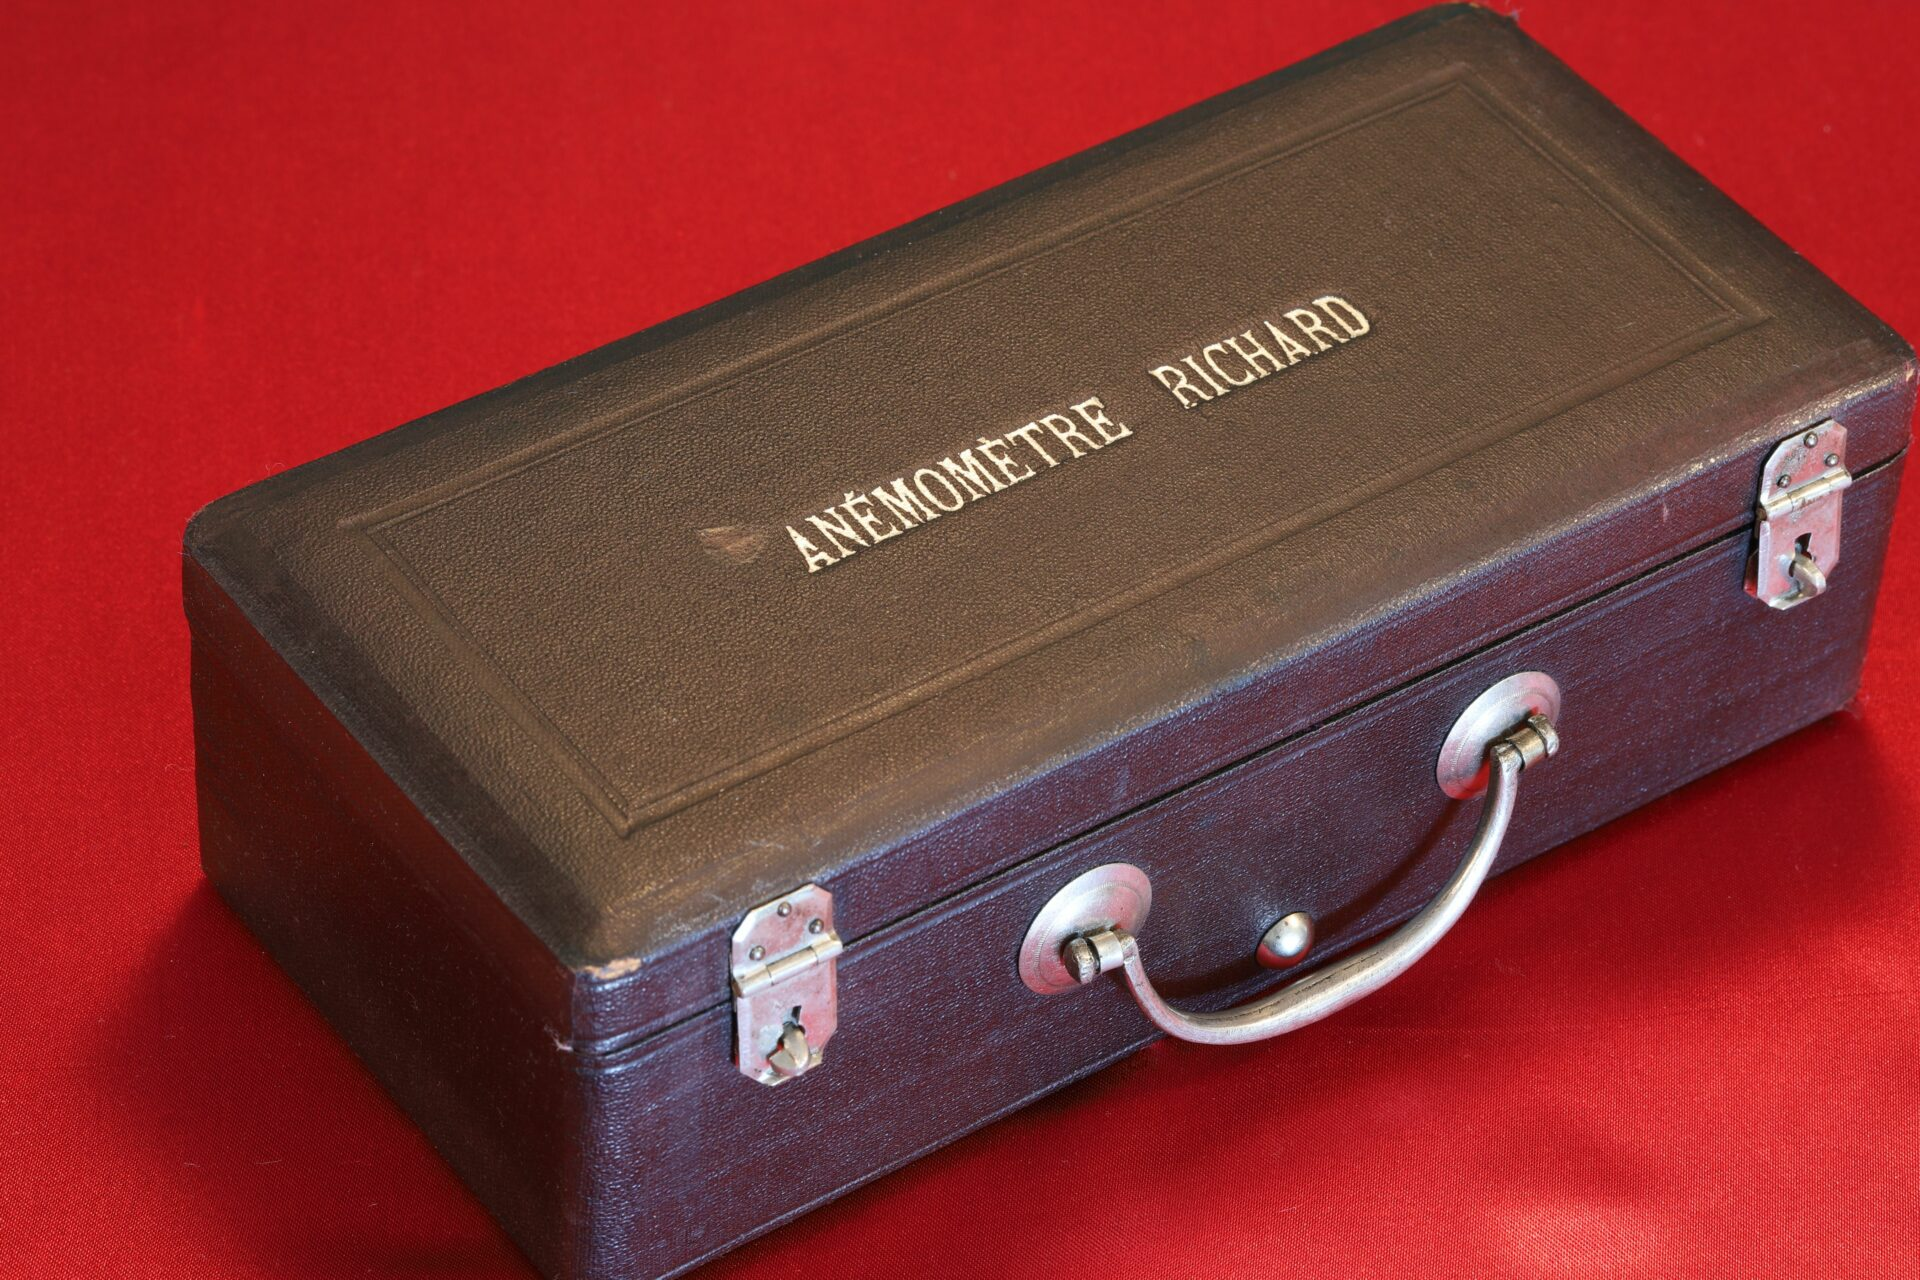 Image of closed case of Jules Richard Anemometer No 2316 c1890